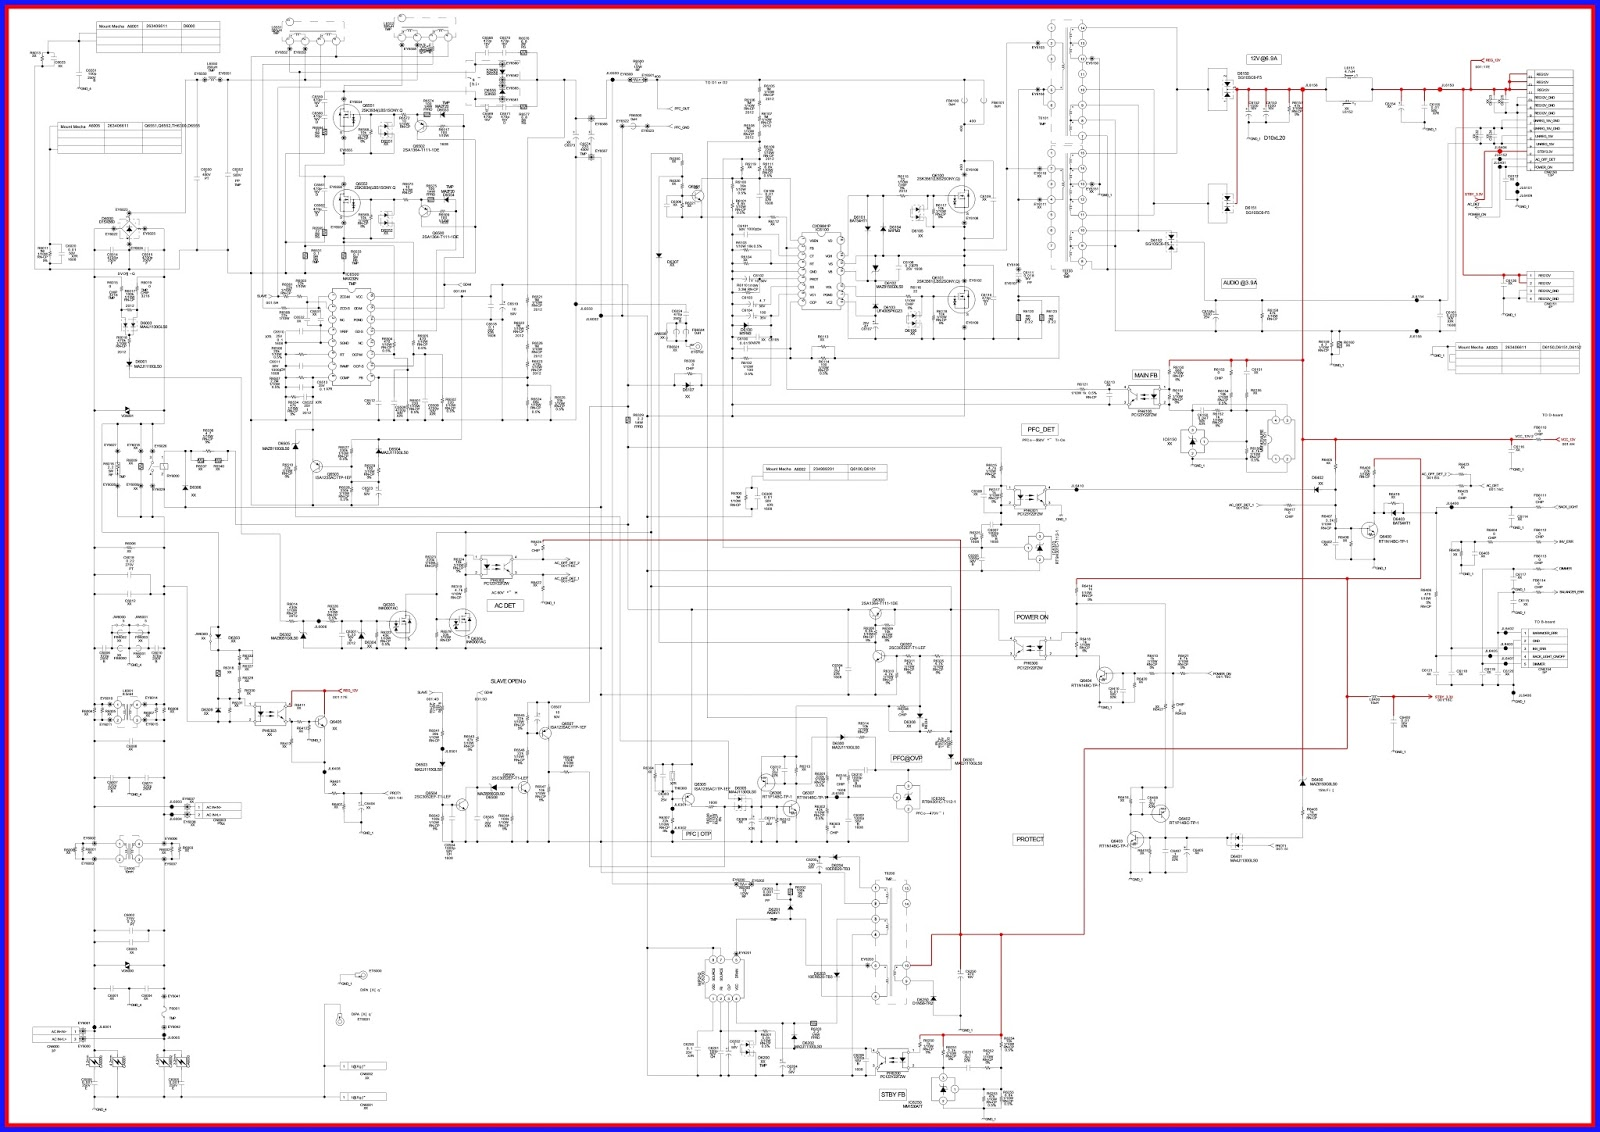 ELECTRONIC EQUIPMENT REPAIR CENTRE : SONY KDL-40U4000 LED